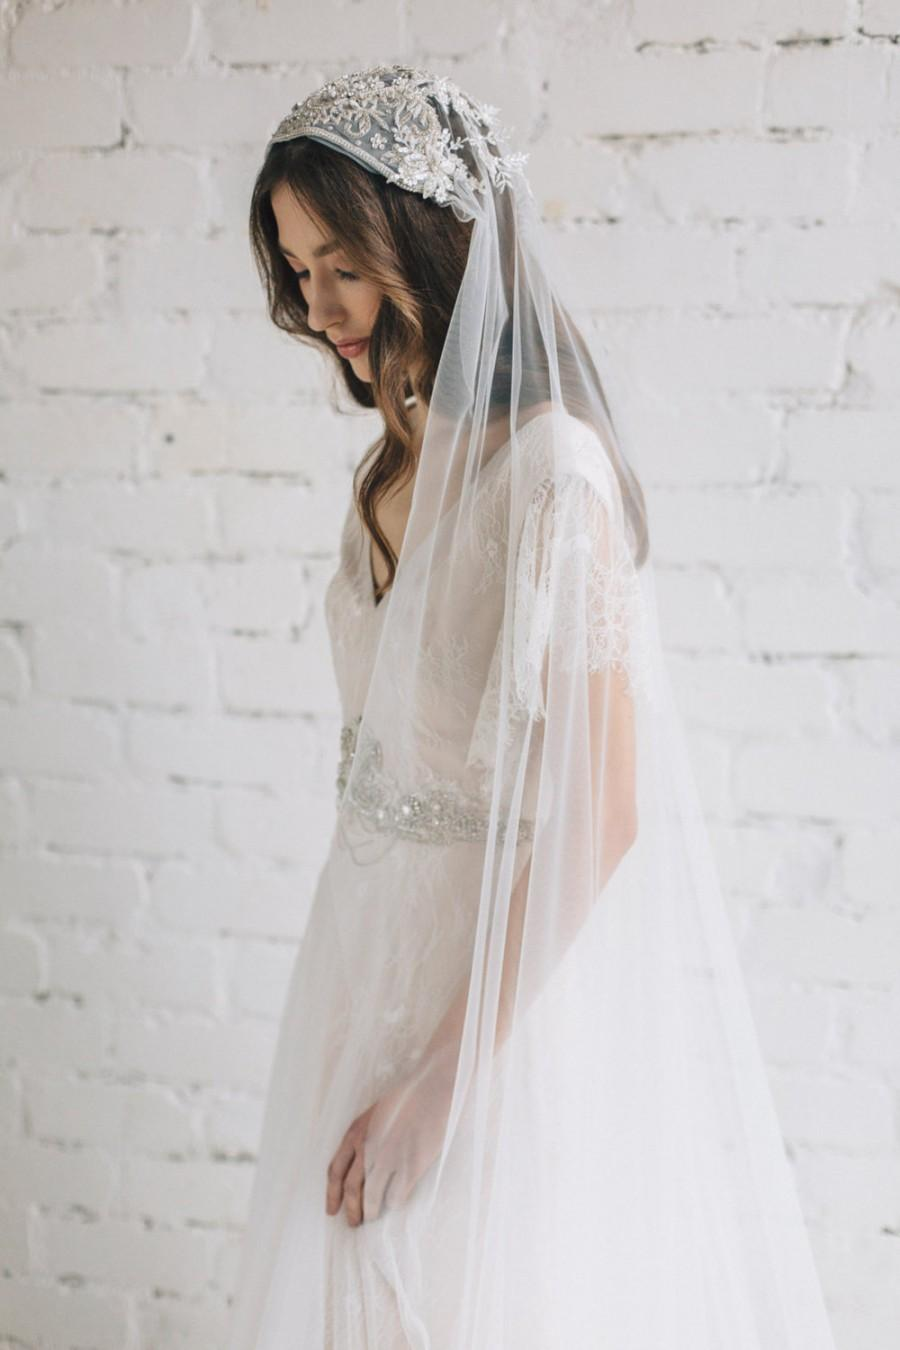 Mariage - Juliet Veil, Wedding Veil , Wedding Veil with Crystals and Pearls , Lace Wedding Veil, Chapel Veil , Cap Veil, Bohemian Veil - Amelia